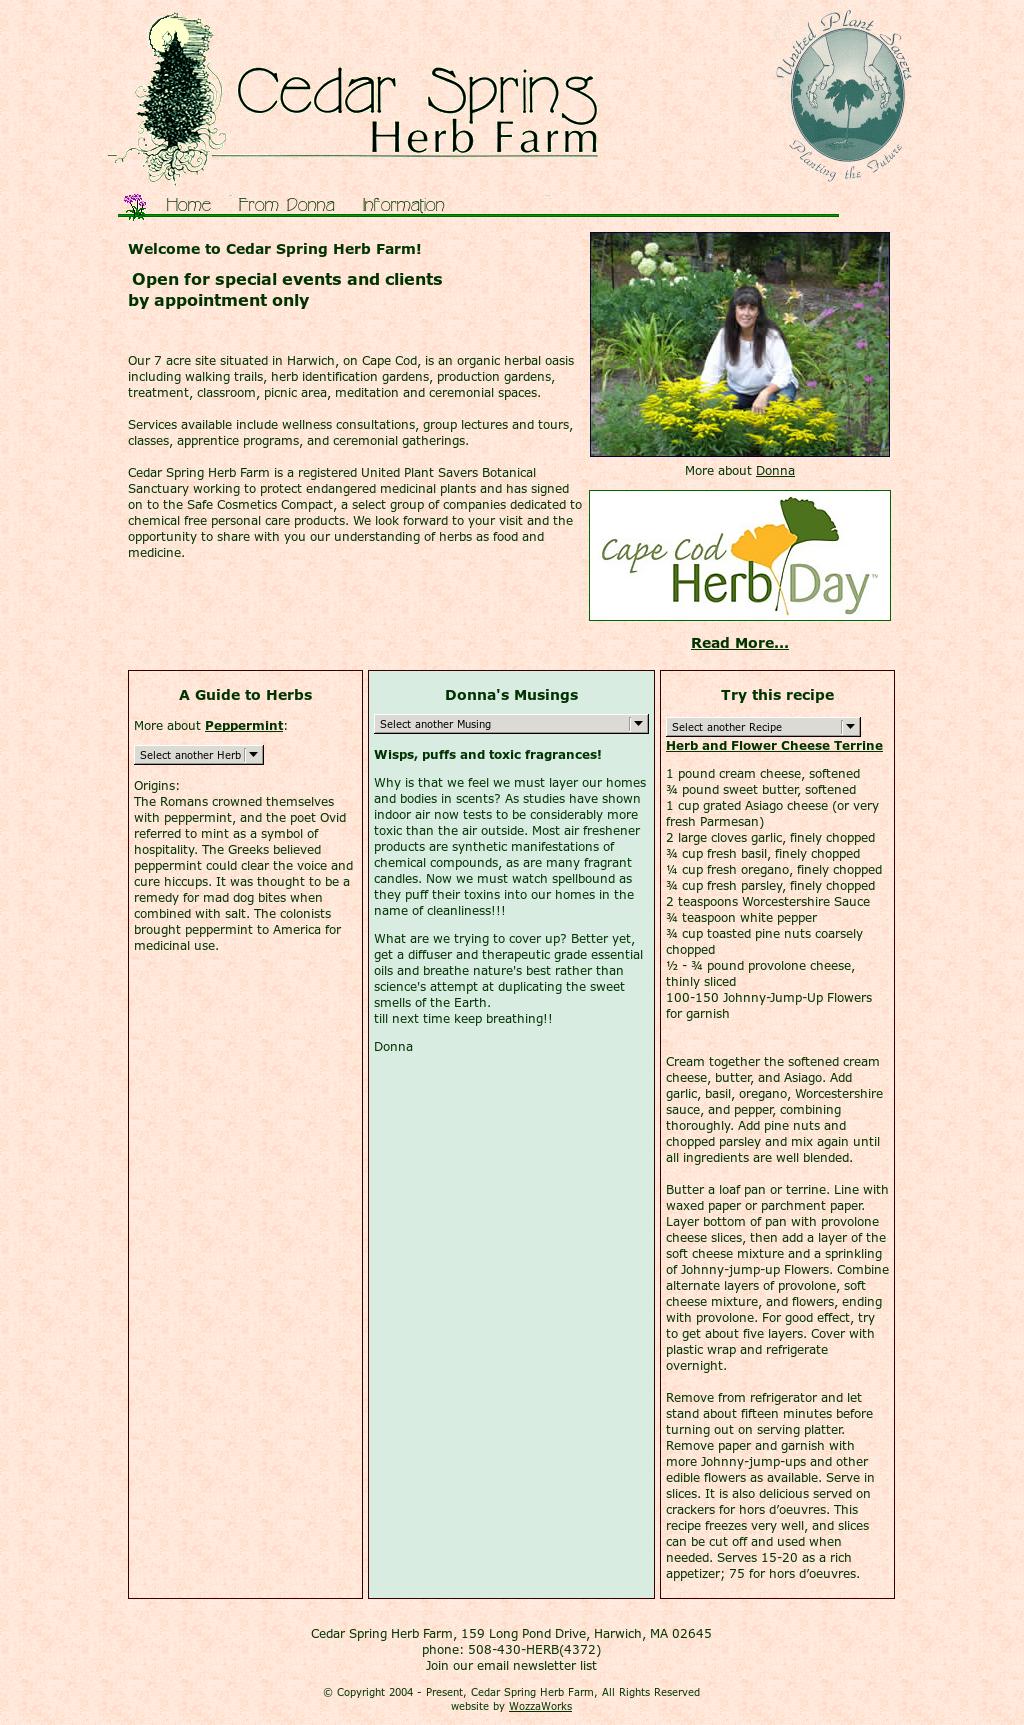 Cedar Spring Herb Farm Competitors, Revenue and Employees